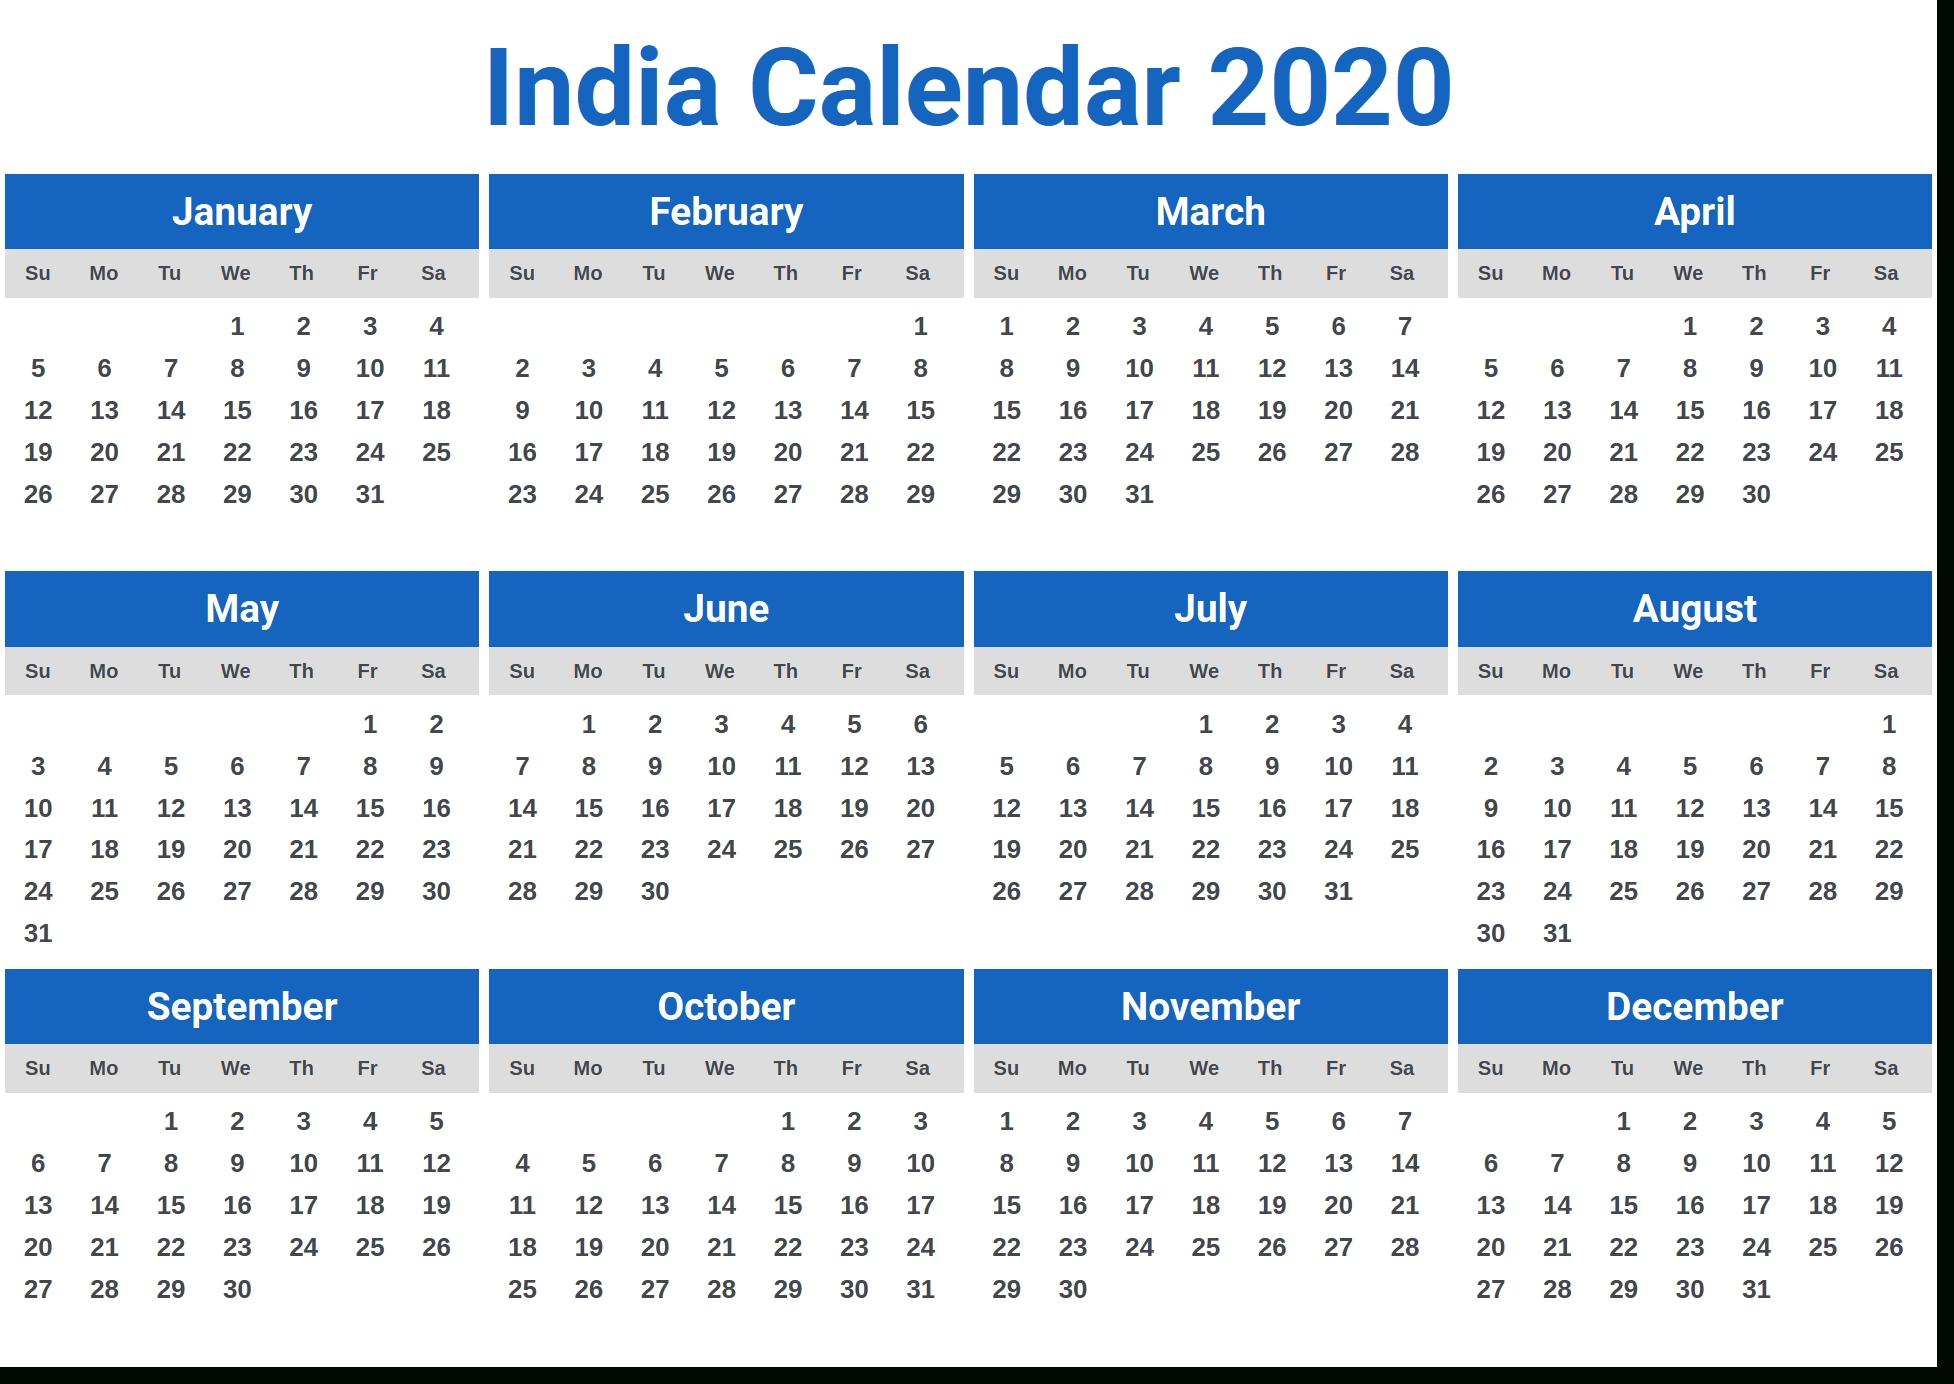 Image For India Calendar 2020 In 2019 | Calendar 2020